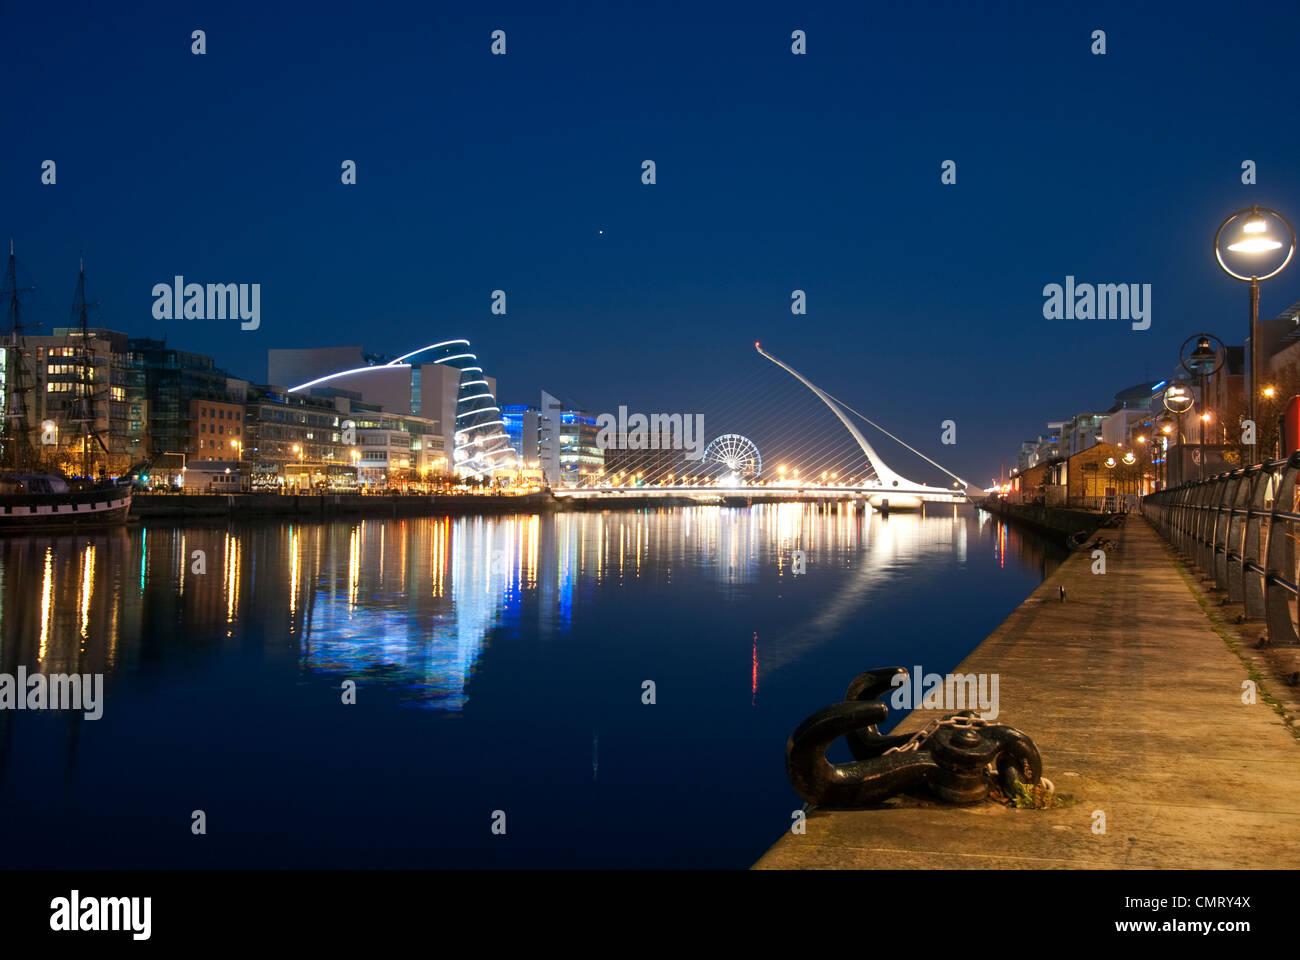 Dublin city docklands seen at night. - Stock Image